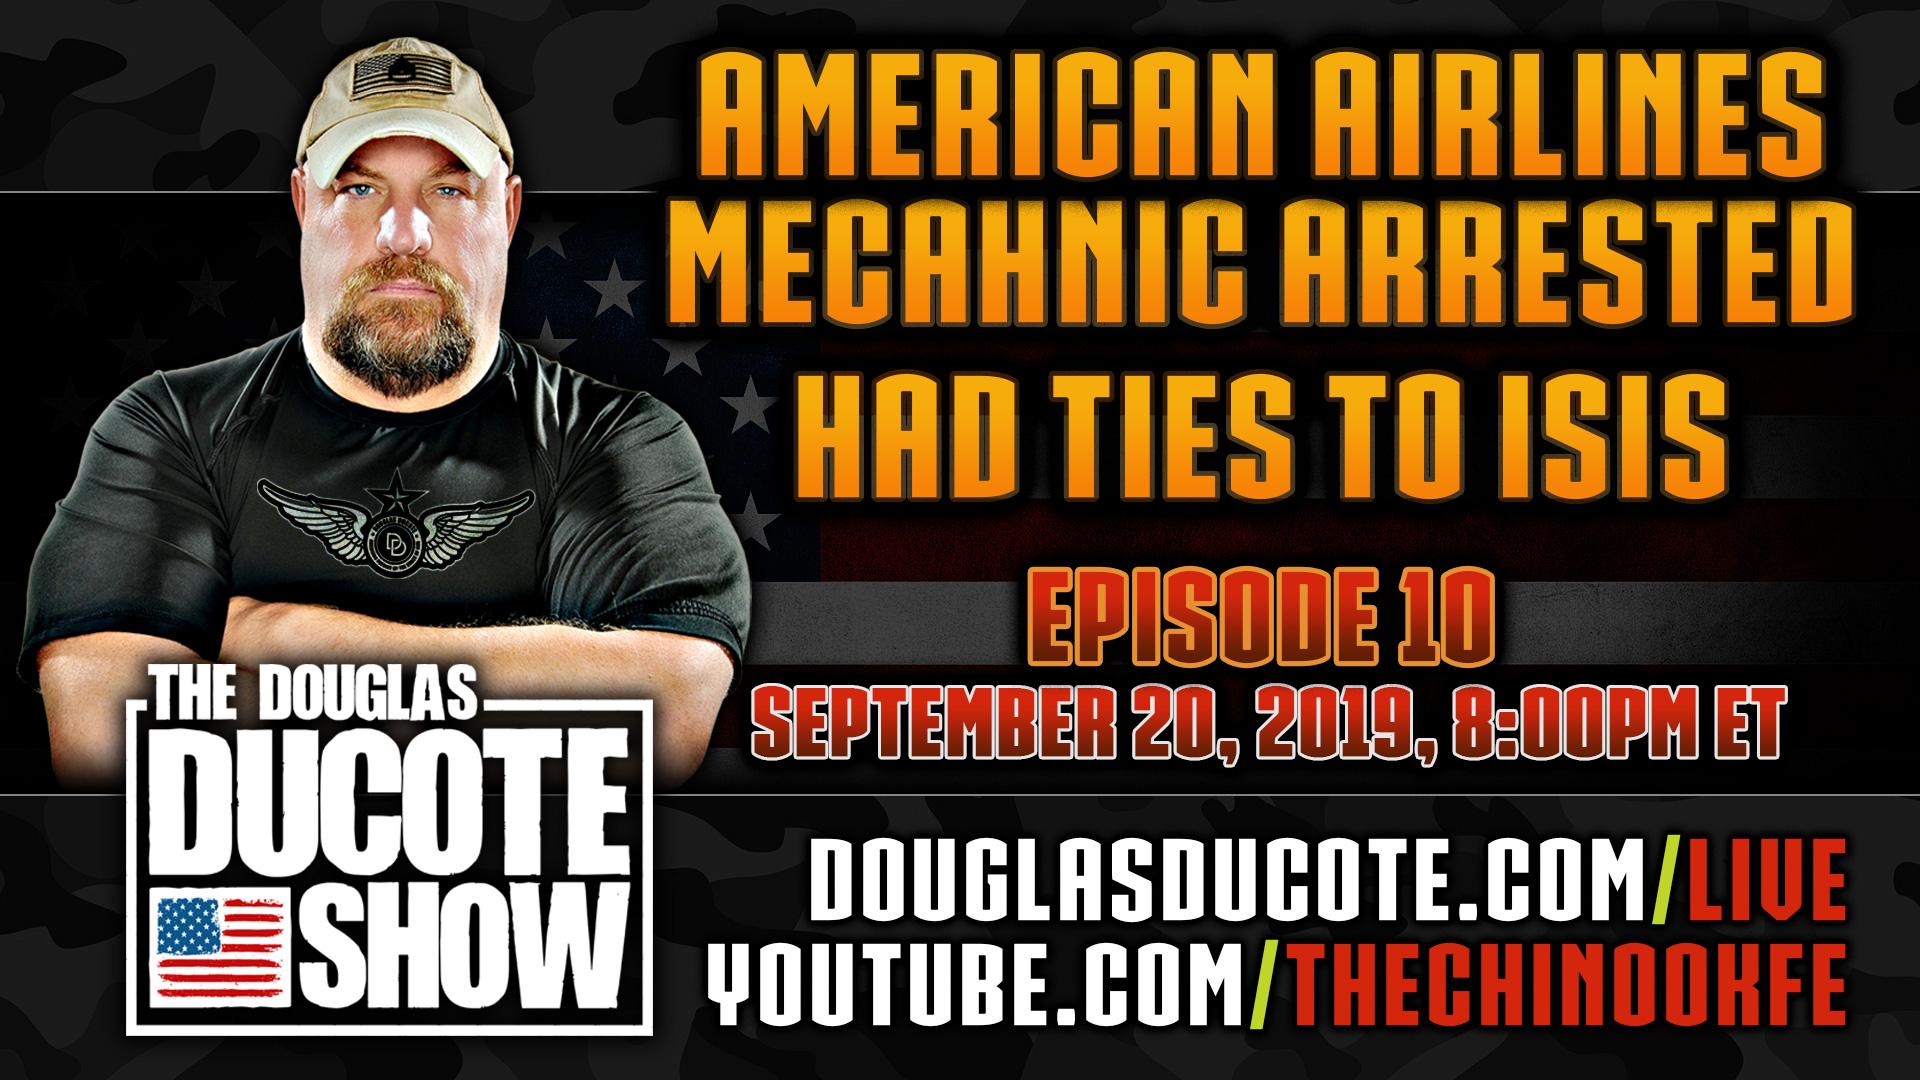 The-Douglas-Ducote-Show-Episode-10